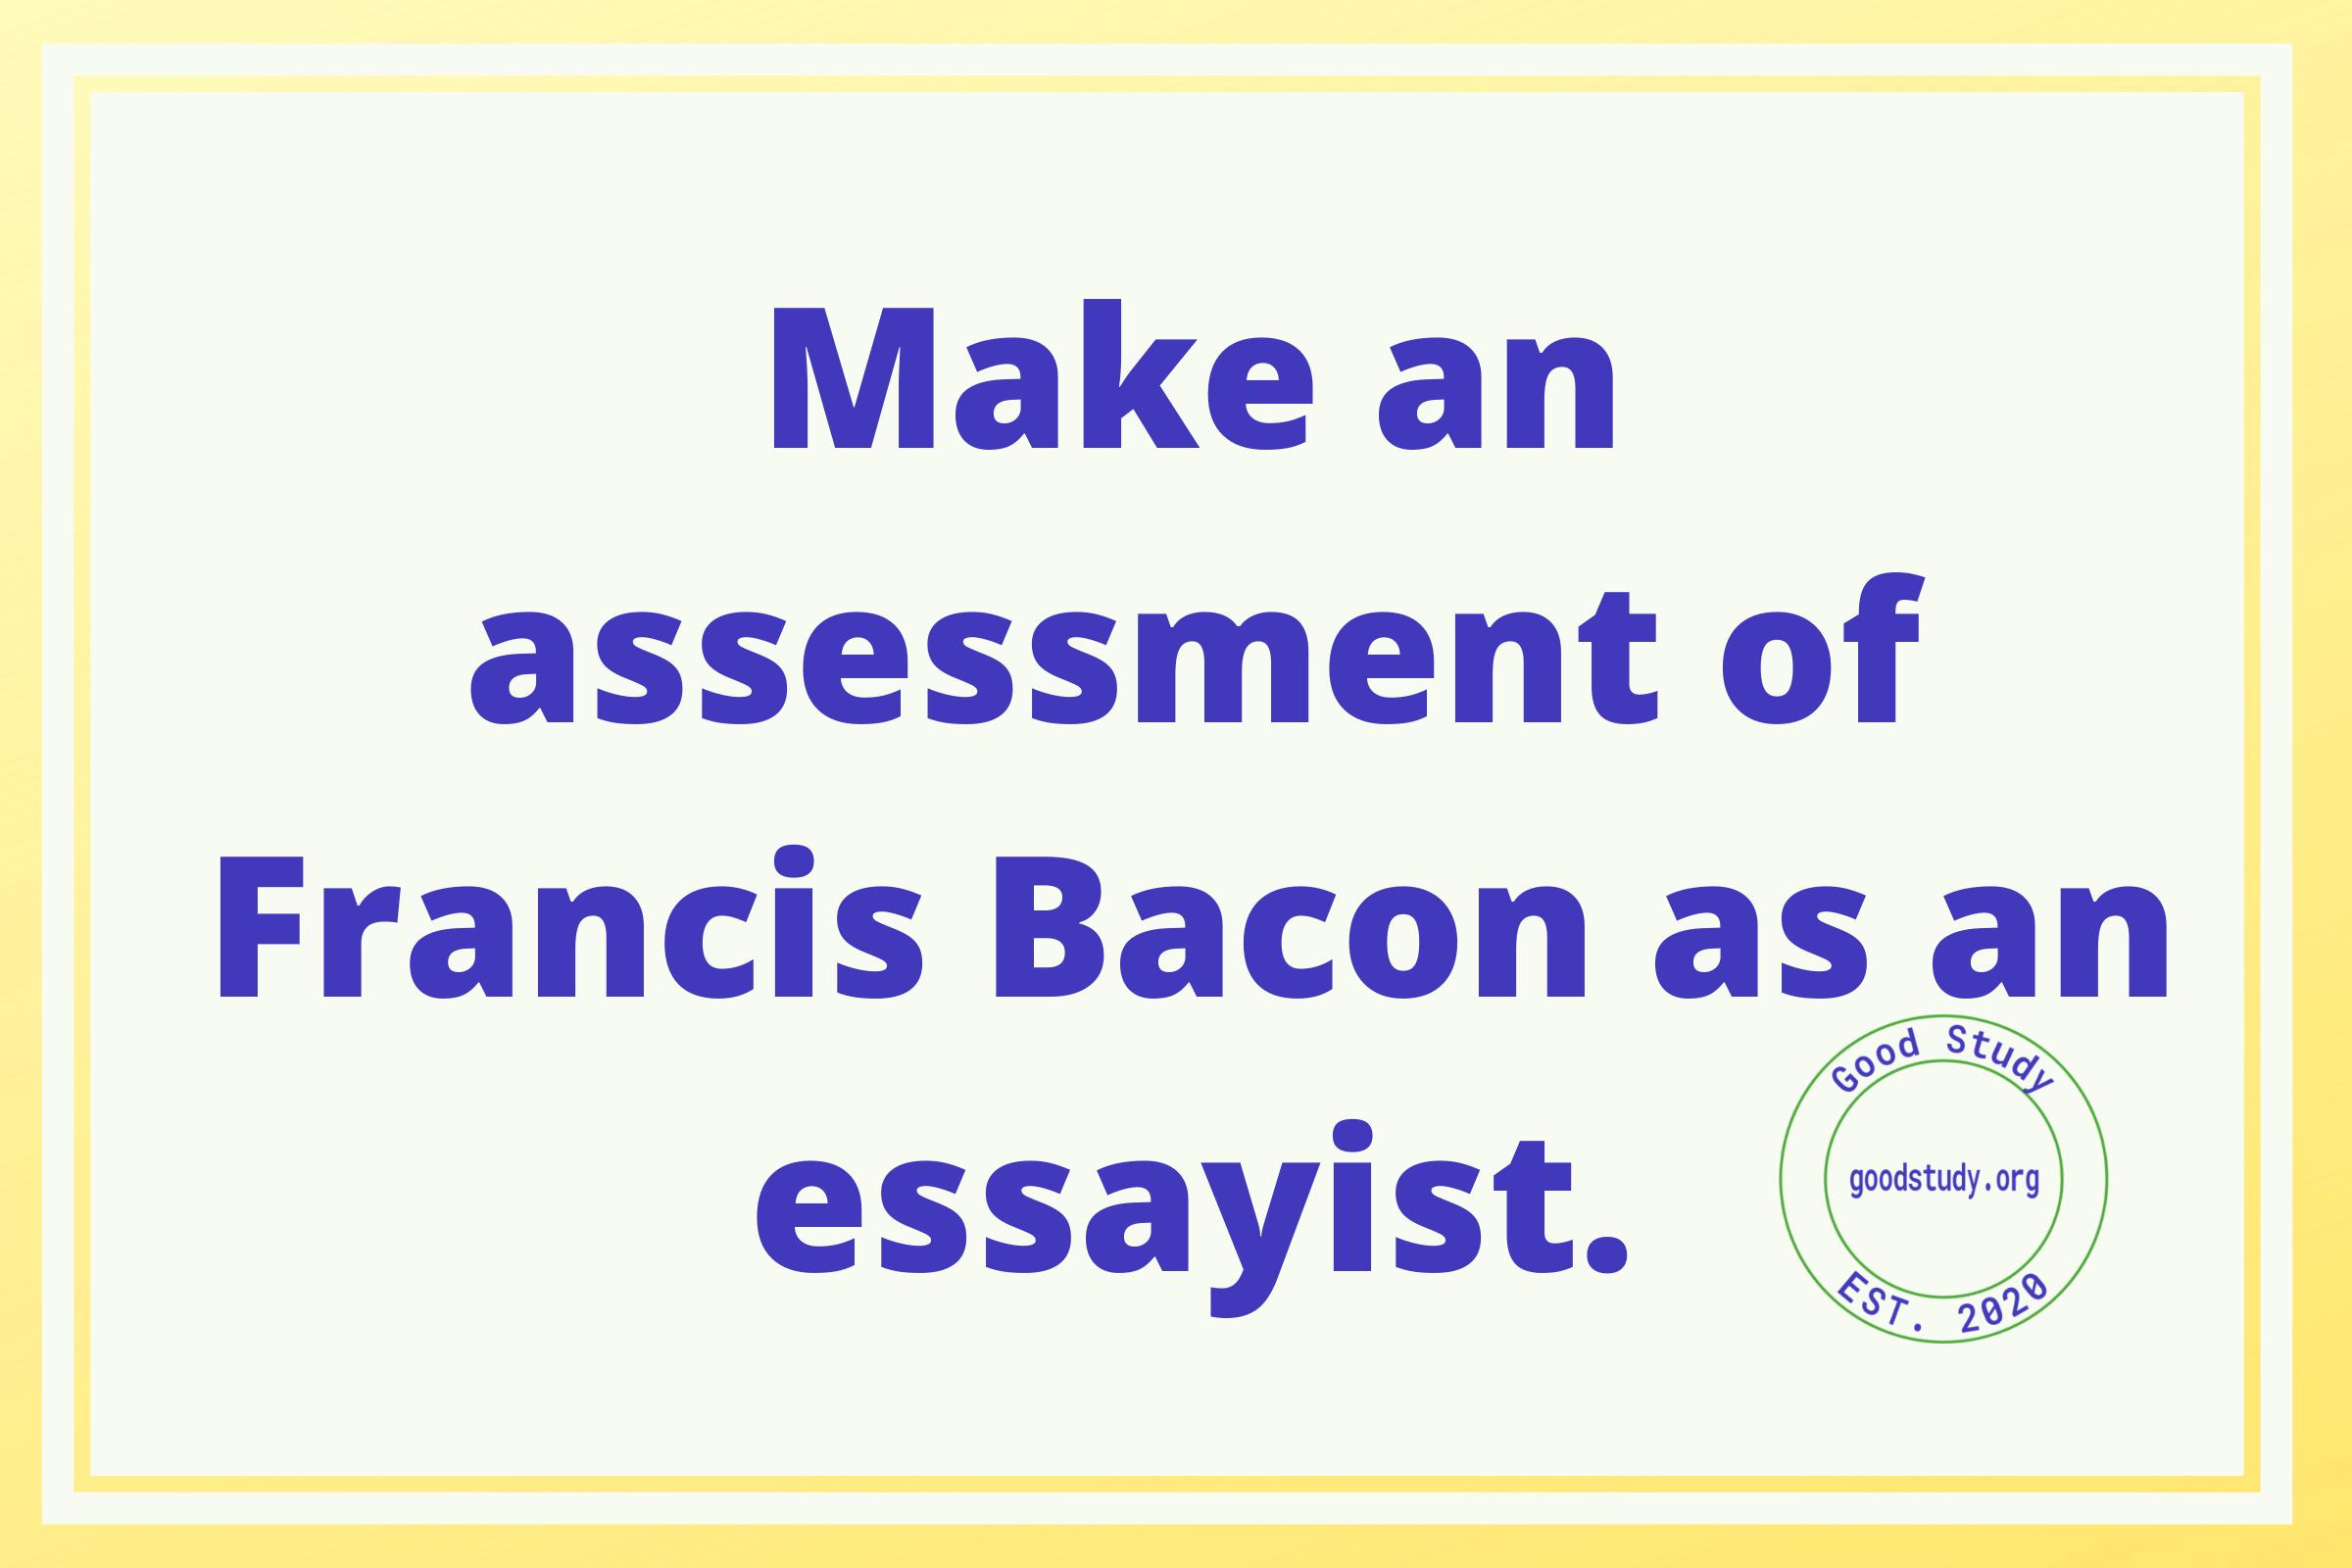 Make an assessment of Francis Bacon as an essayist.